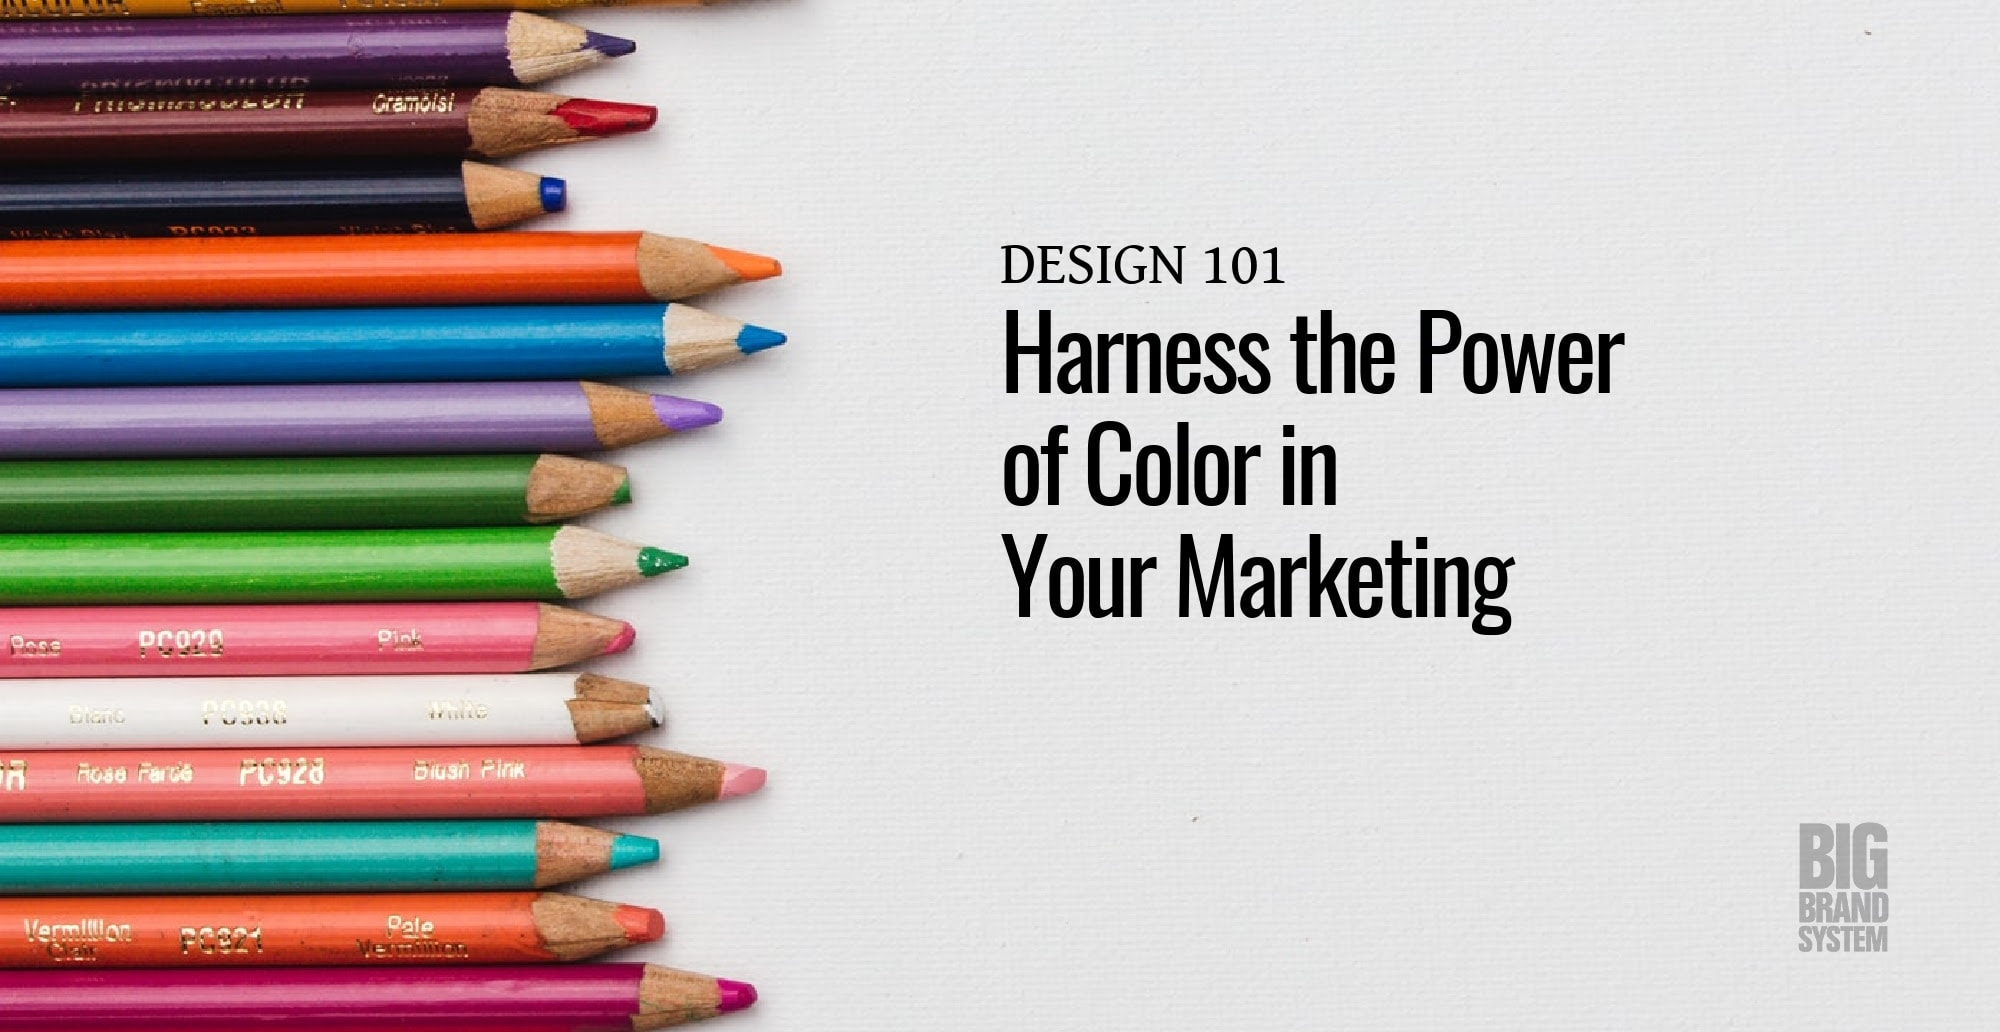 A set of colored pencils